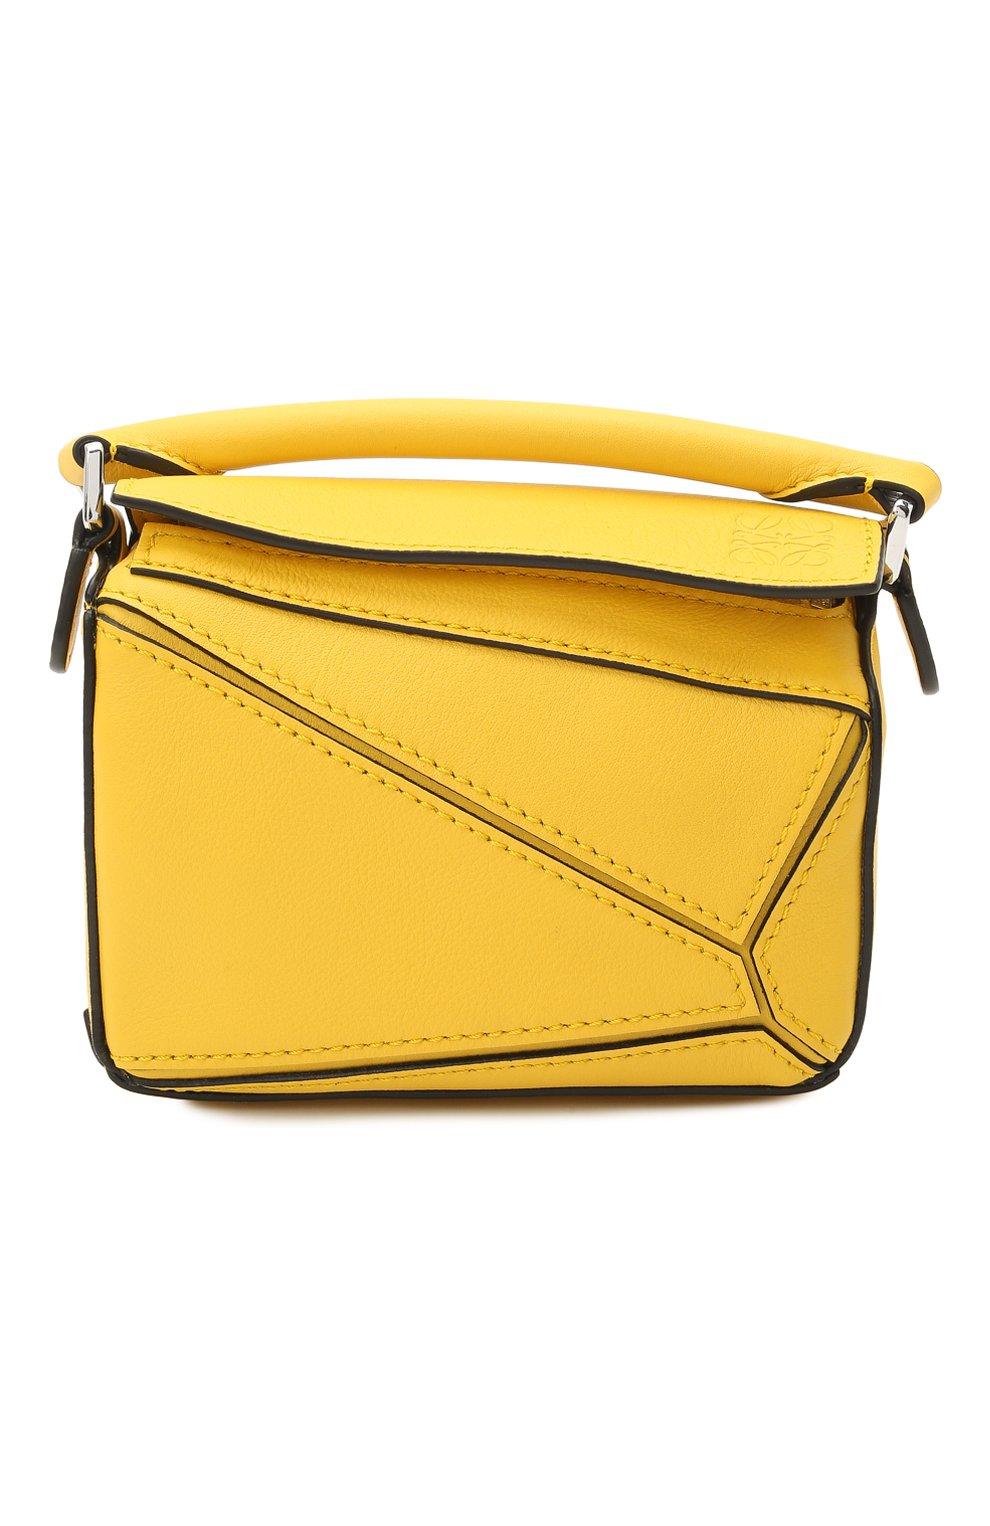 Женская сумка puzzle nano LOEWE желтого цвета, арт. A510U98X01 | Фото 1 (Ремень/цепочка: С цепочкой, На ремешке; Сумки-технические: Сумки top-handle; Материал: Натуральная кожа; Размер: mini)